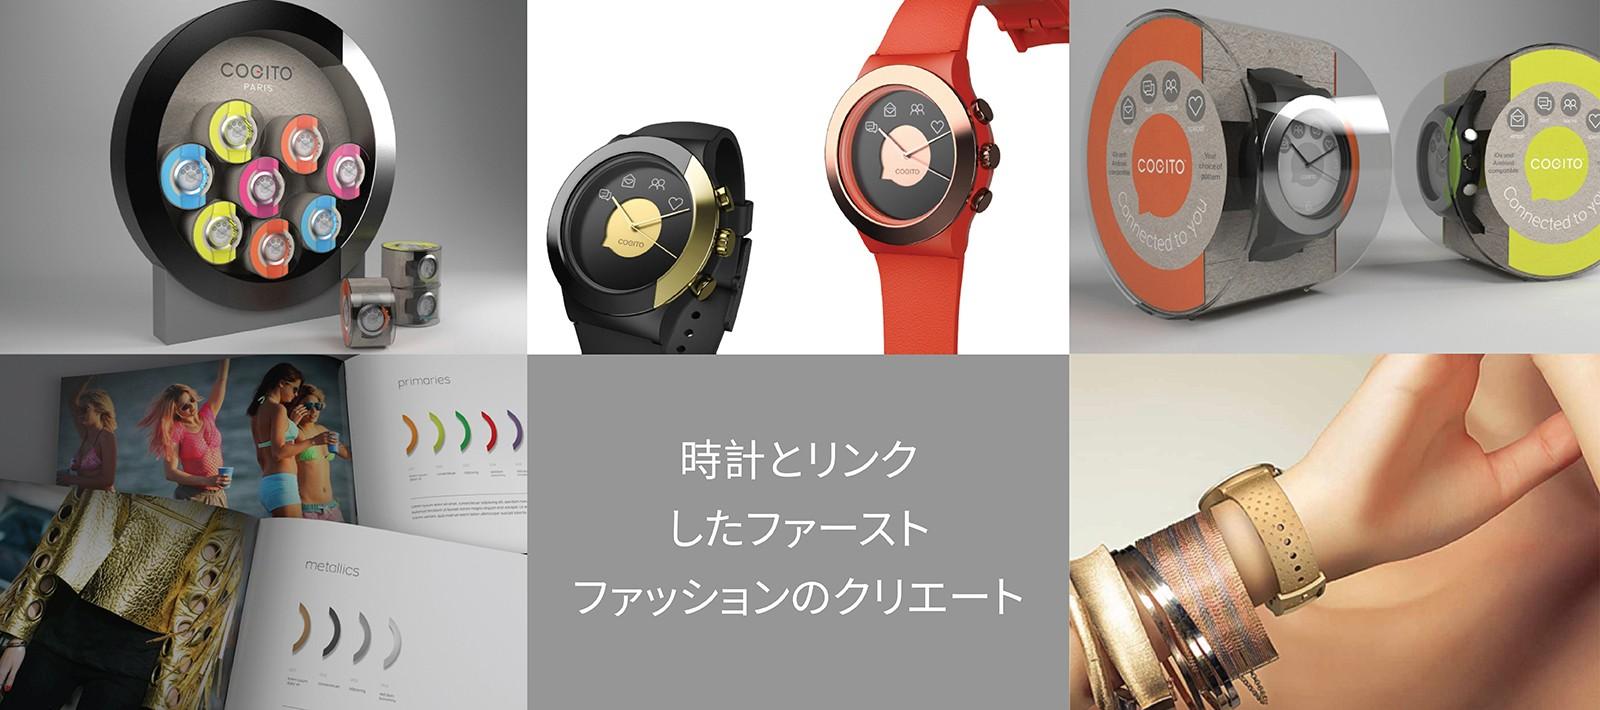 Cogito-consumer-brand-creation-jp-2